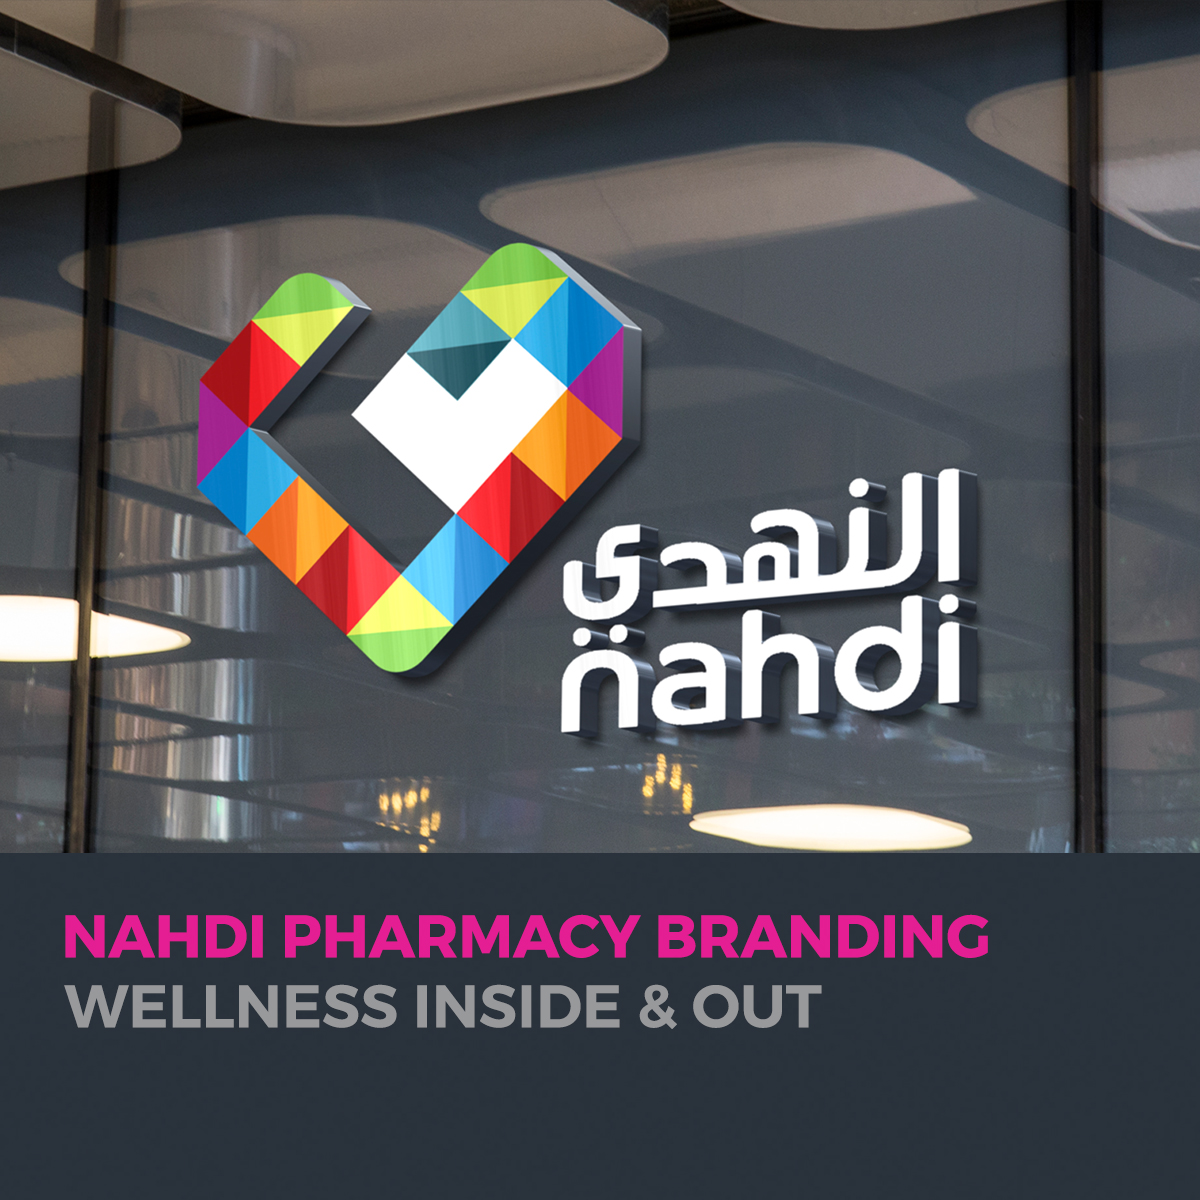 nahdi branding